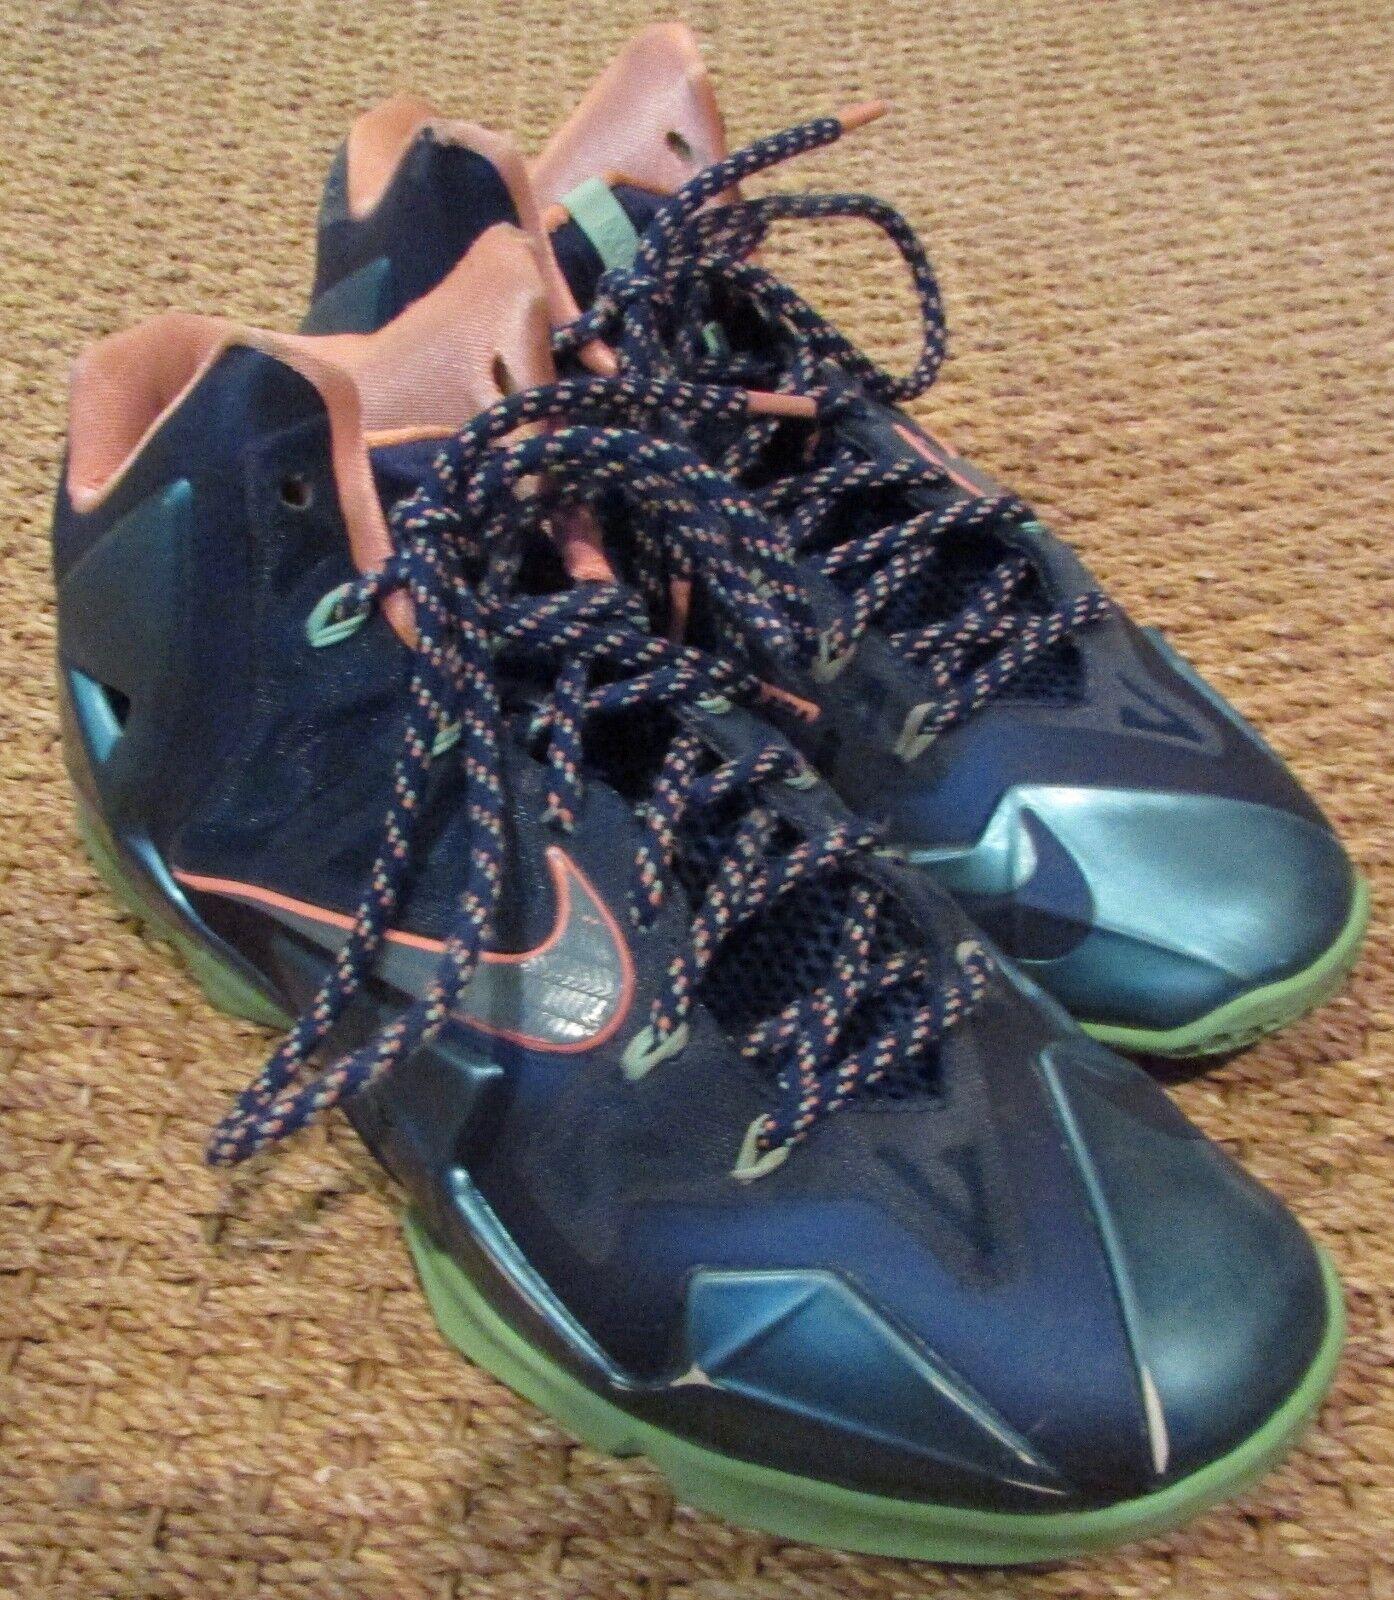 2018 Nike Lebron 11 XI Akron Vs Miami Men's Basketball Shoes 616175-400 SZ 12